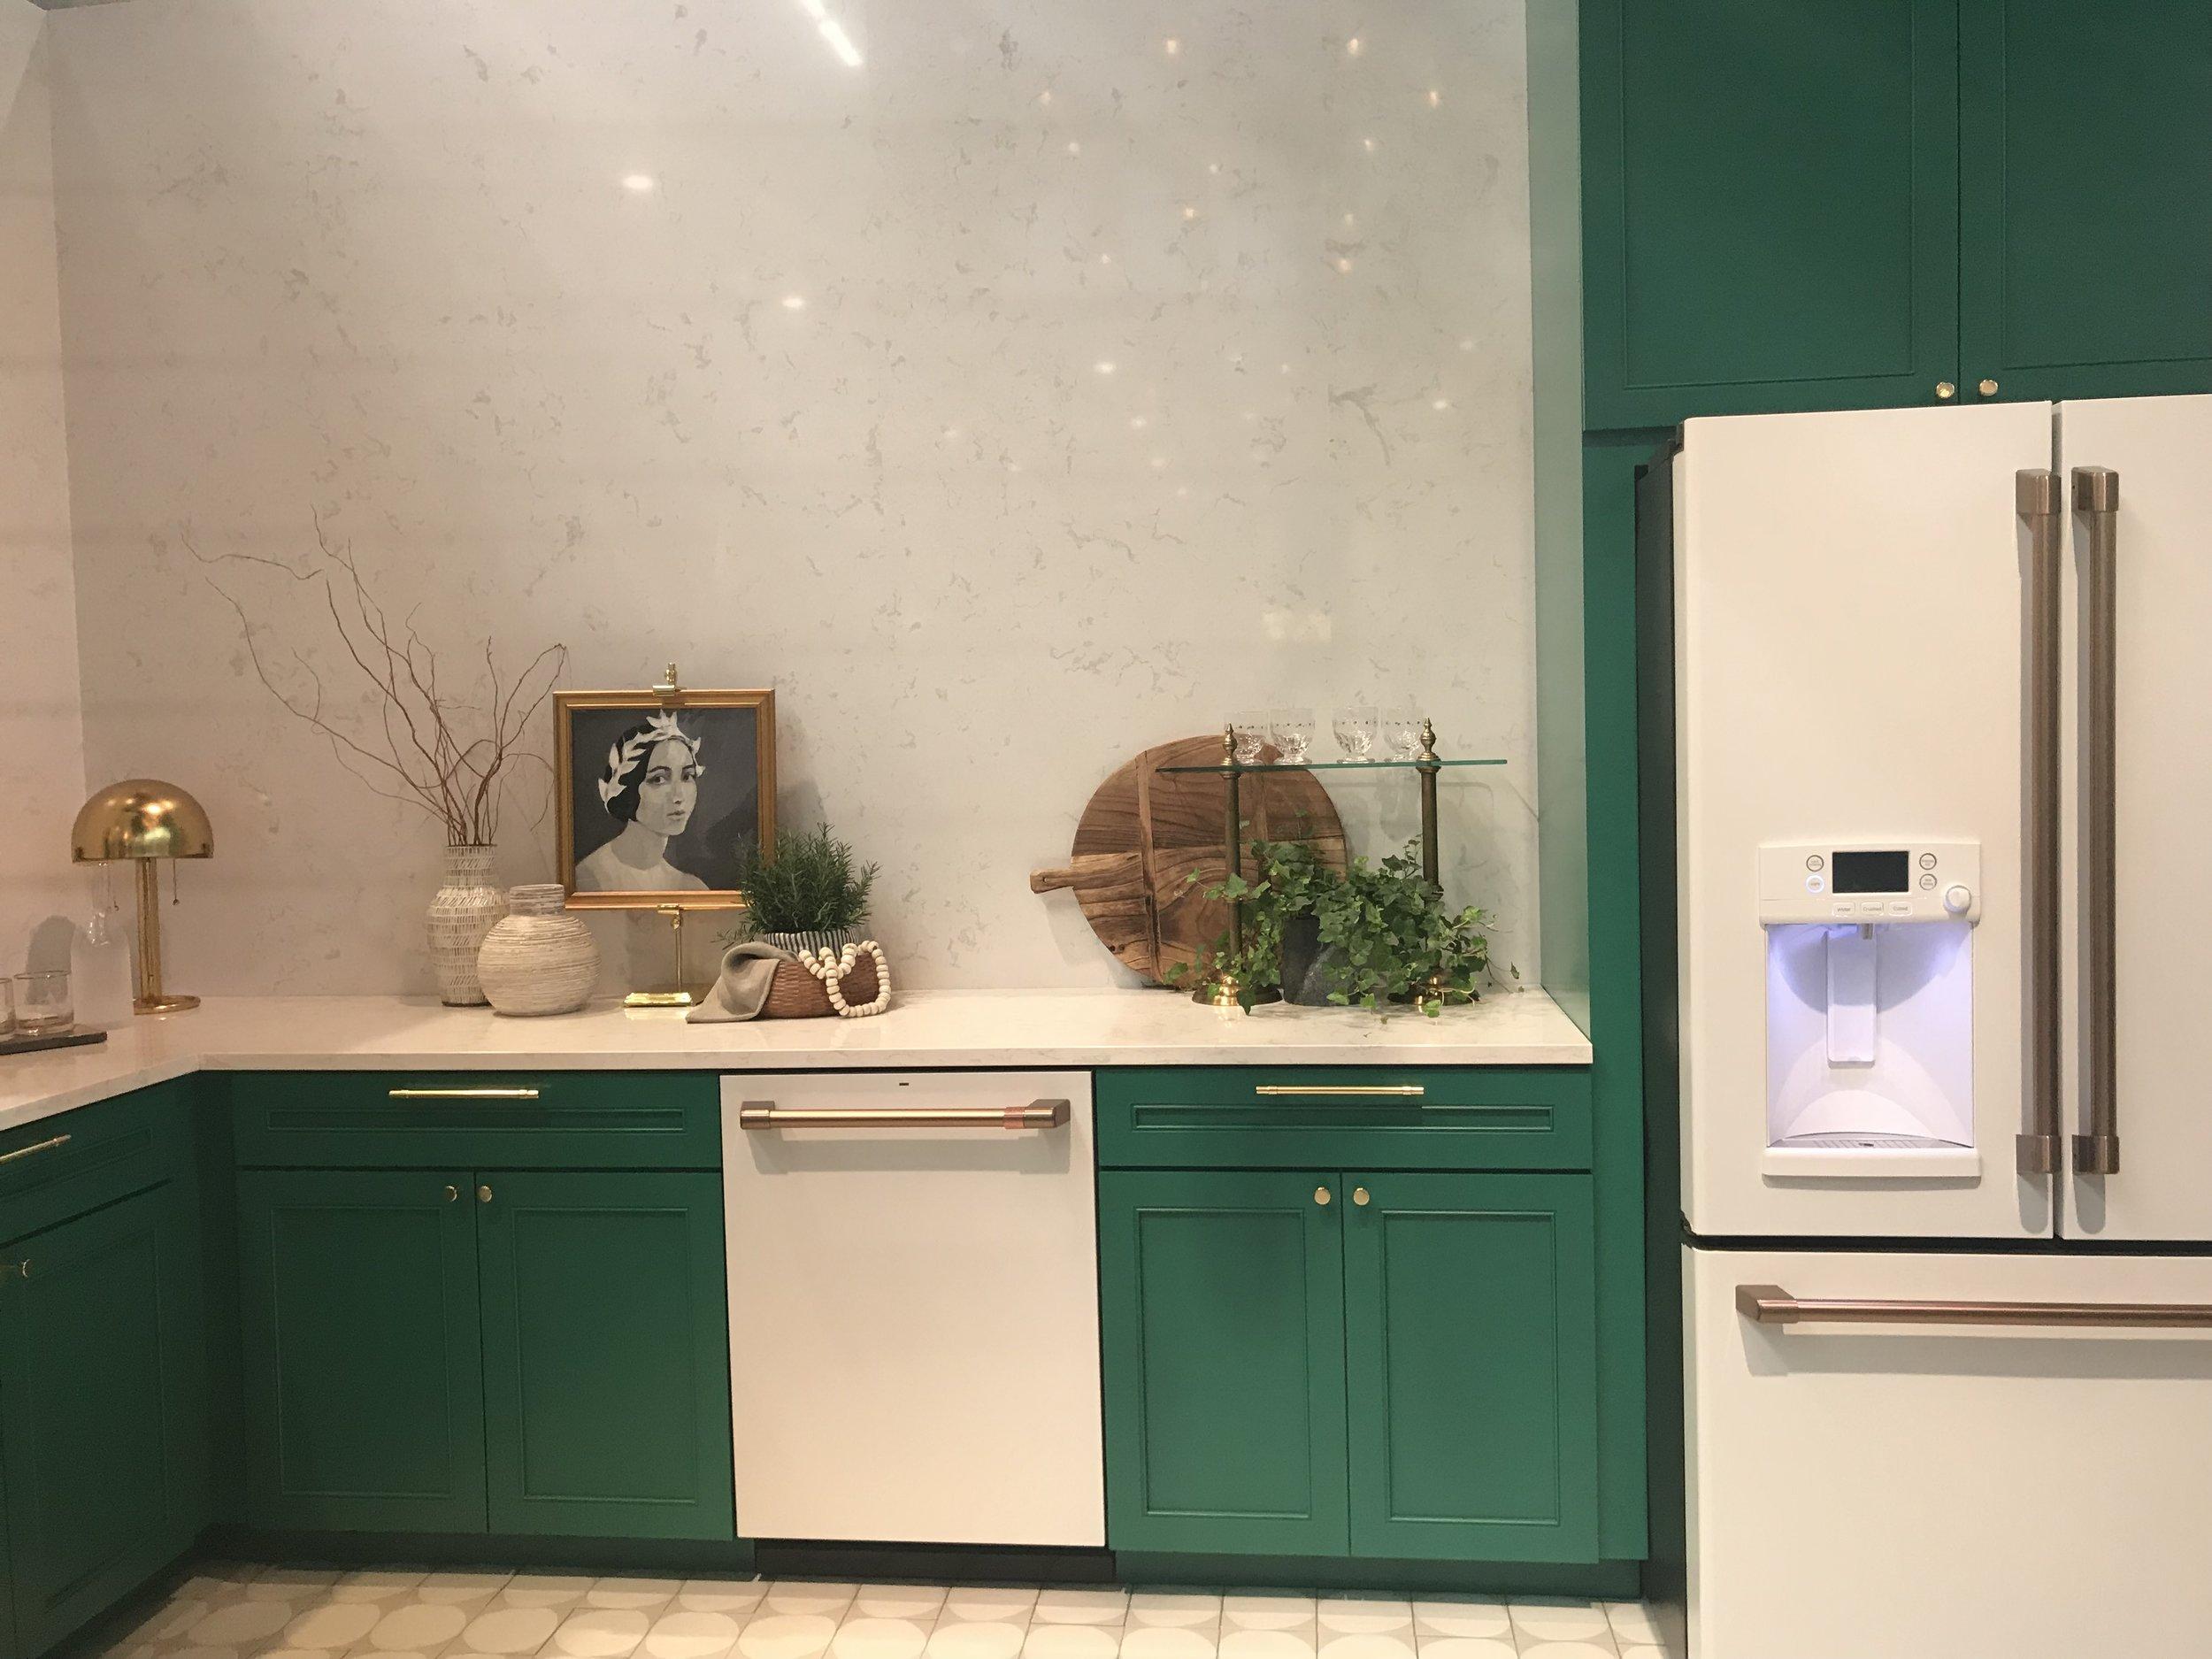 GE Cafe Appliances